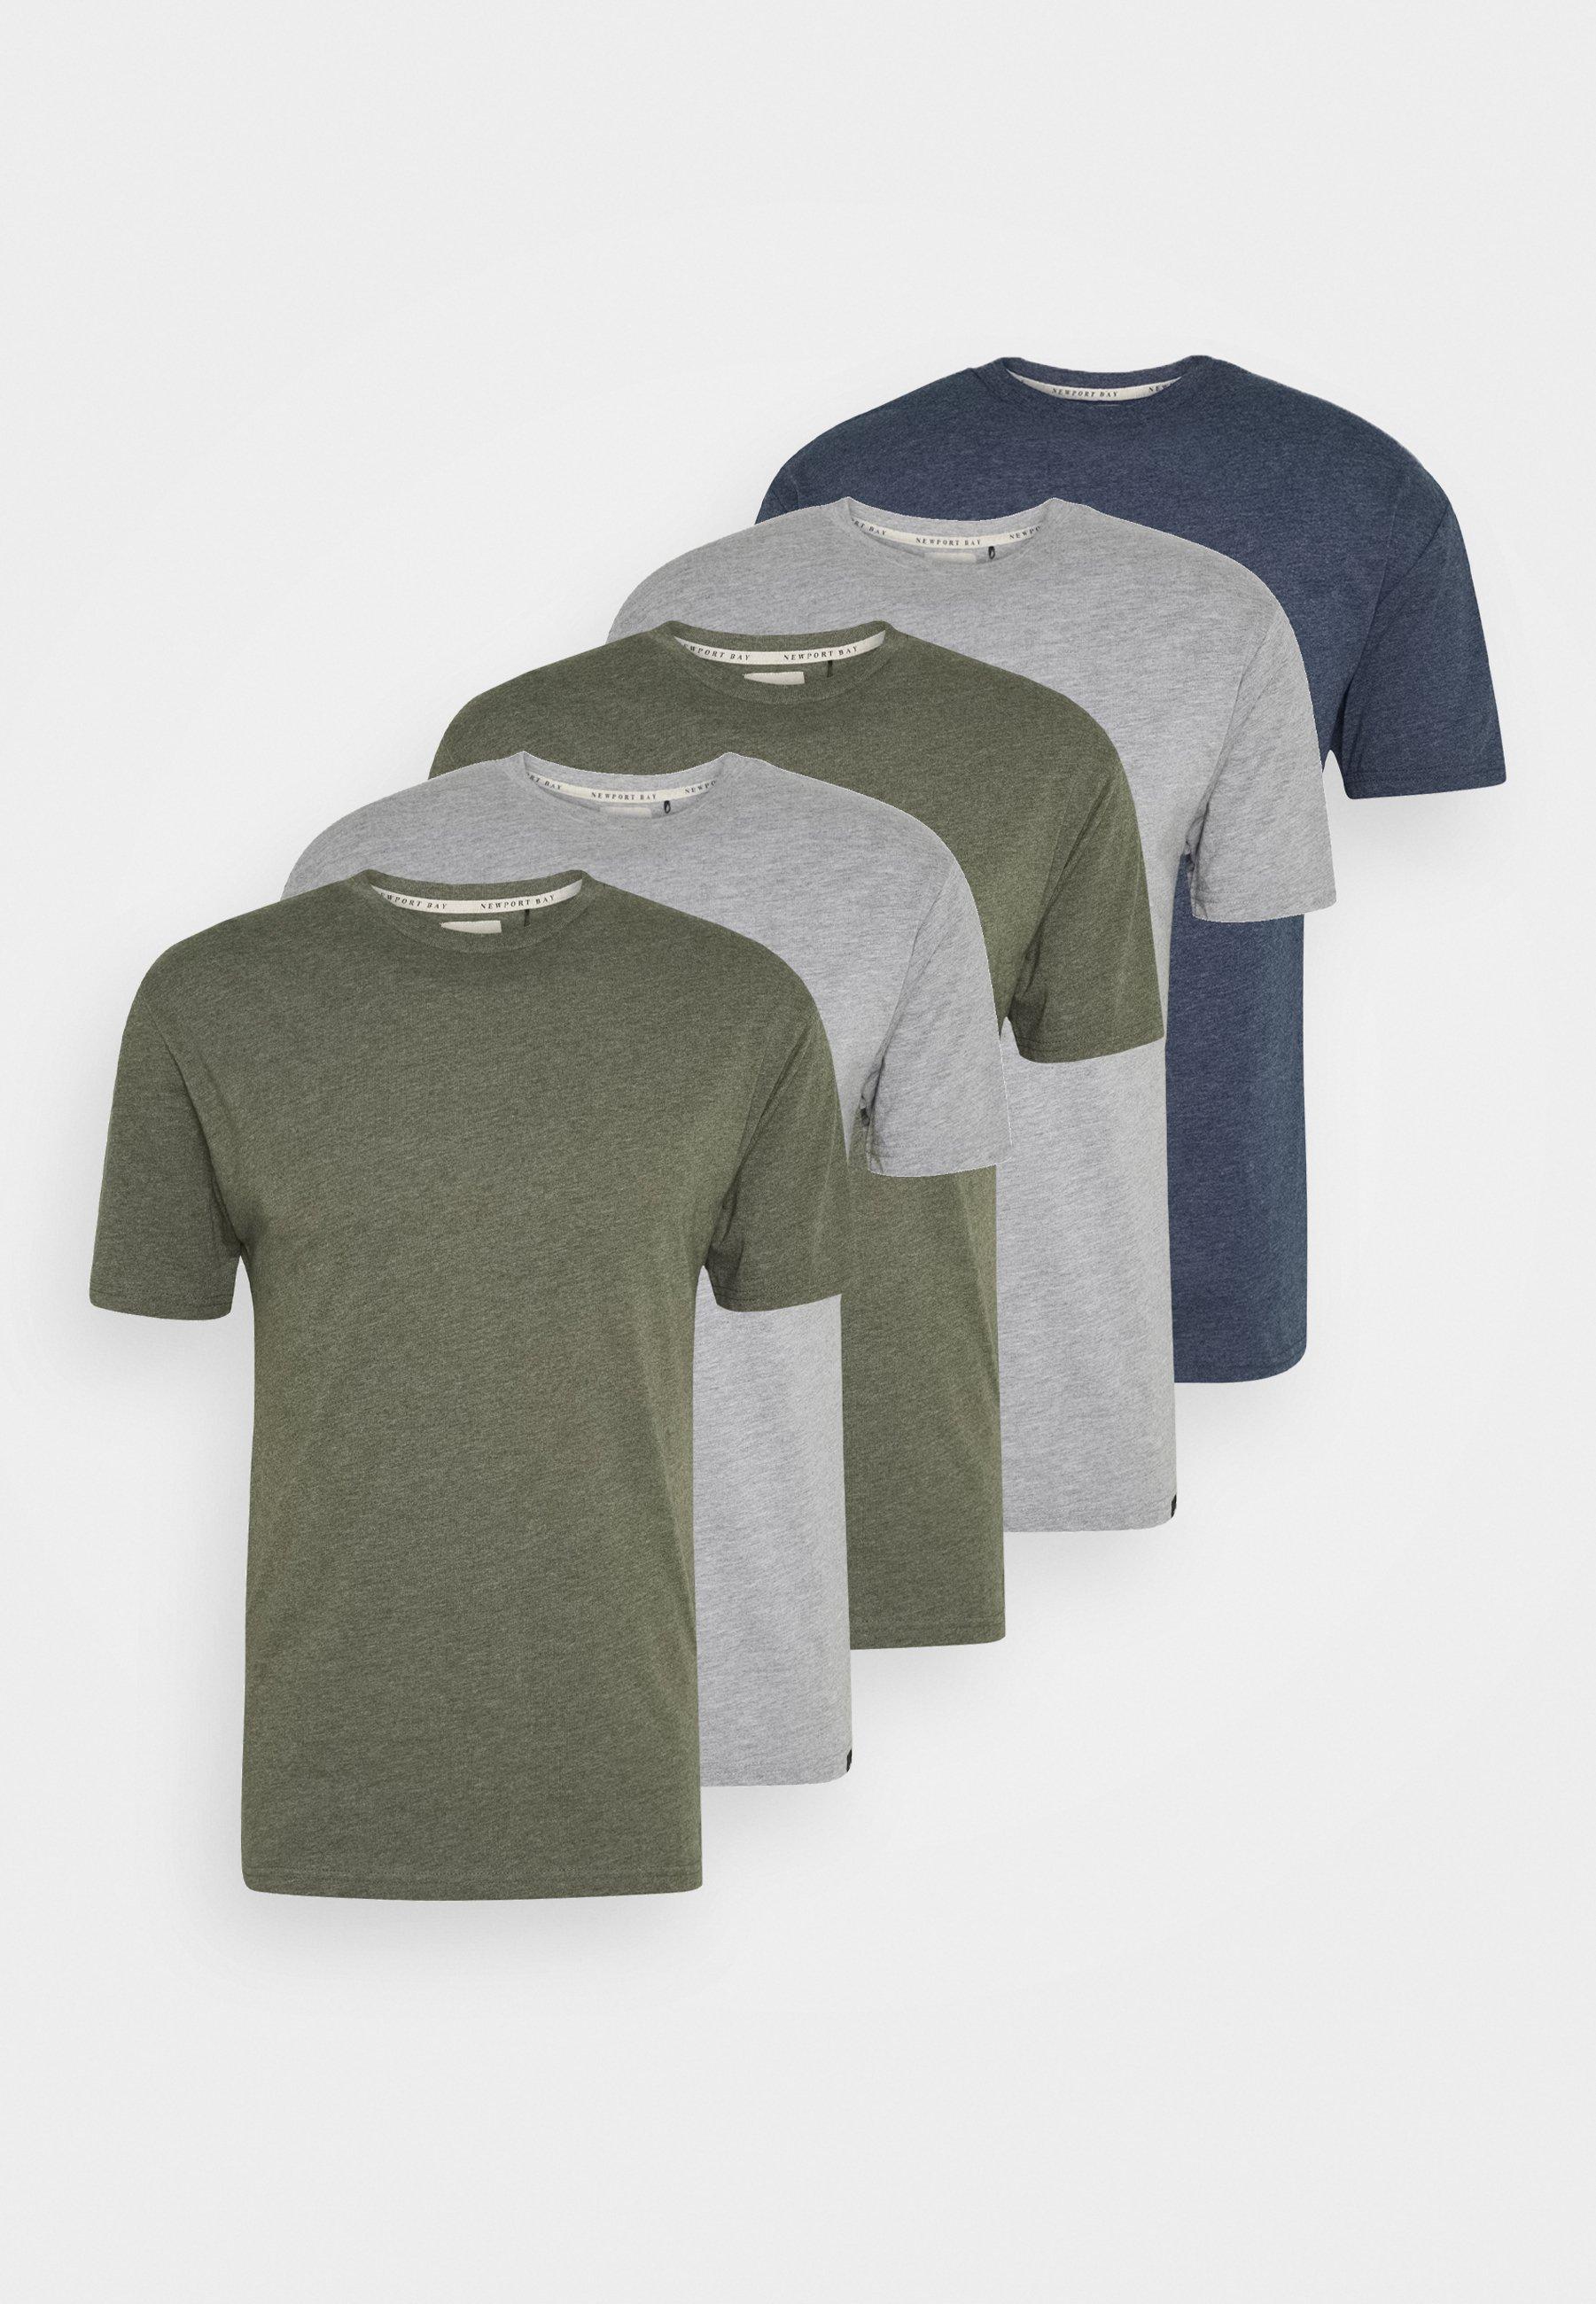 Newport Bay Sailing Club Tee 5 Pack - T-shirts Mottled Light Grey/lysegrå-melert